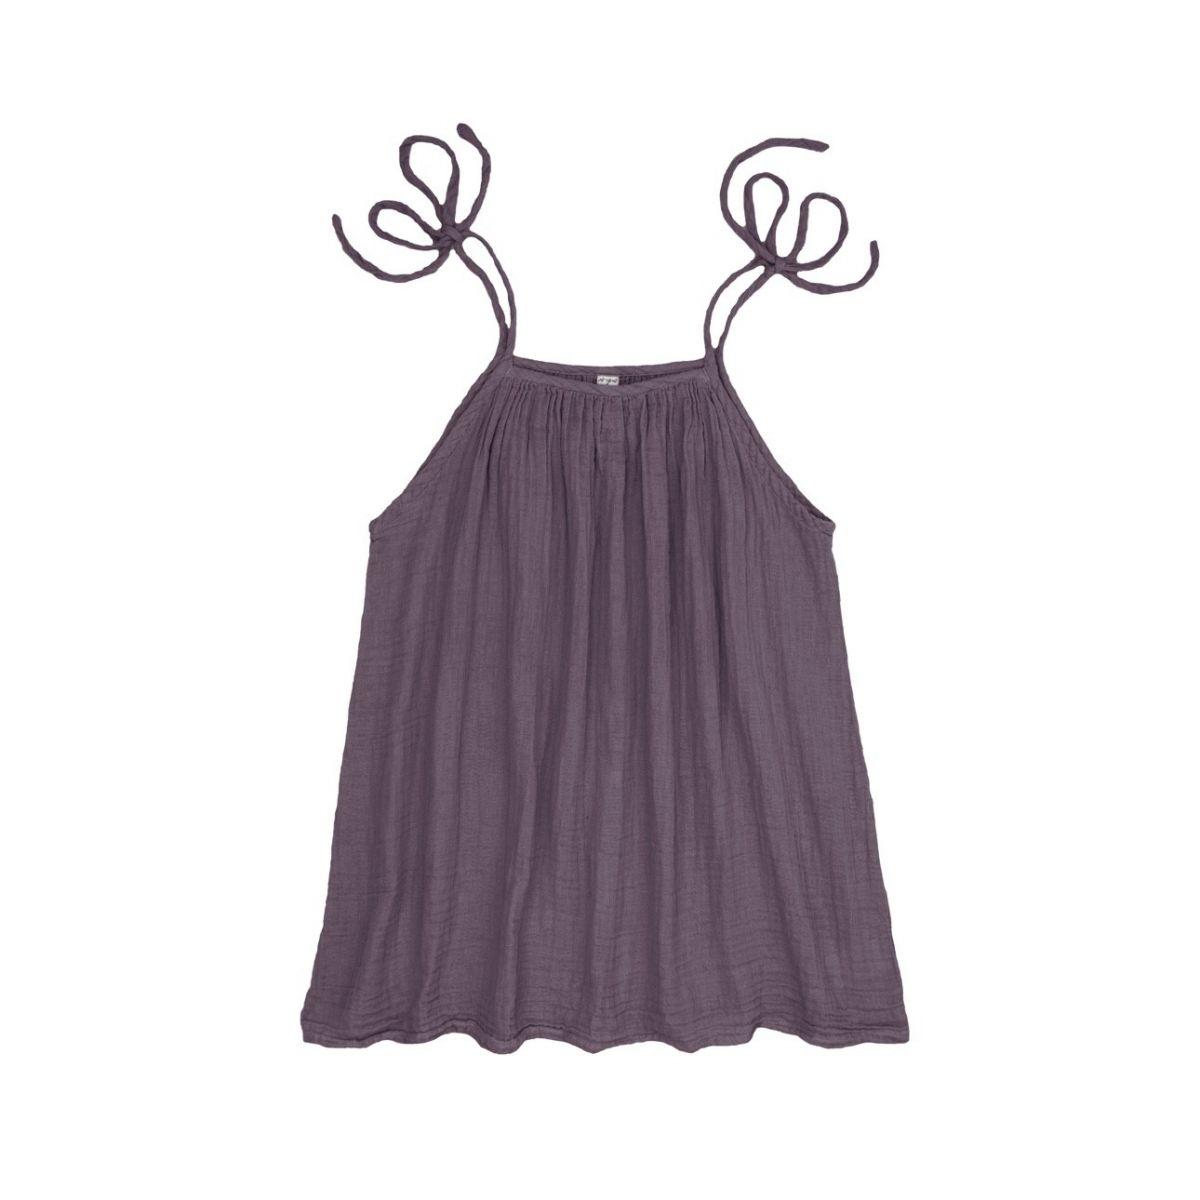 Dress short for mum Mia dusty lilac - Numero 74